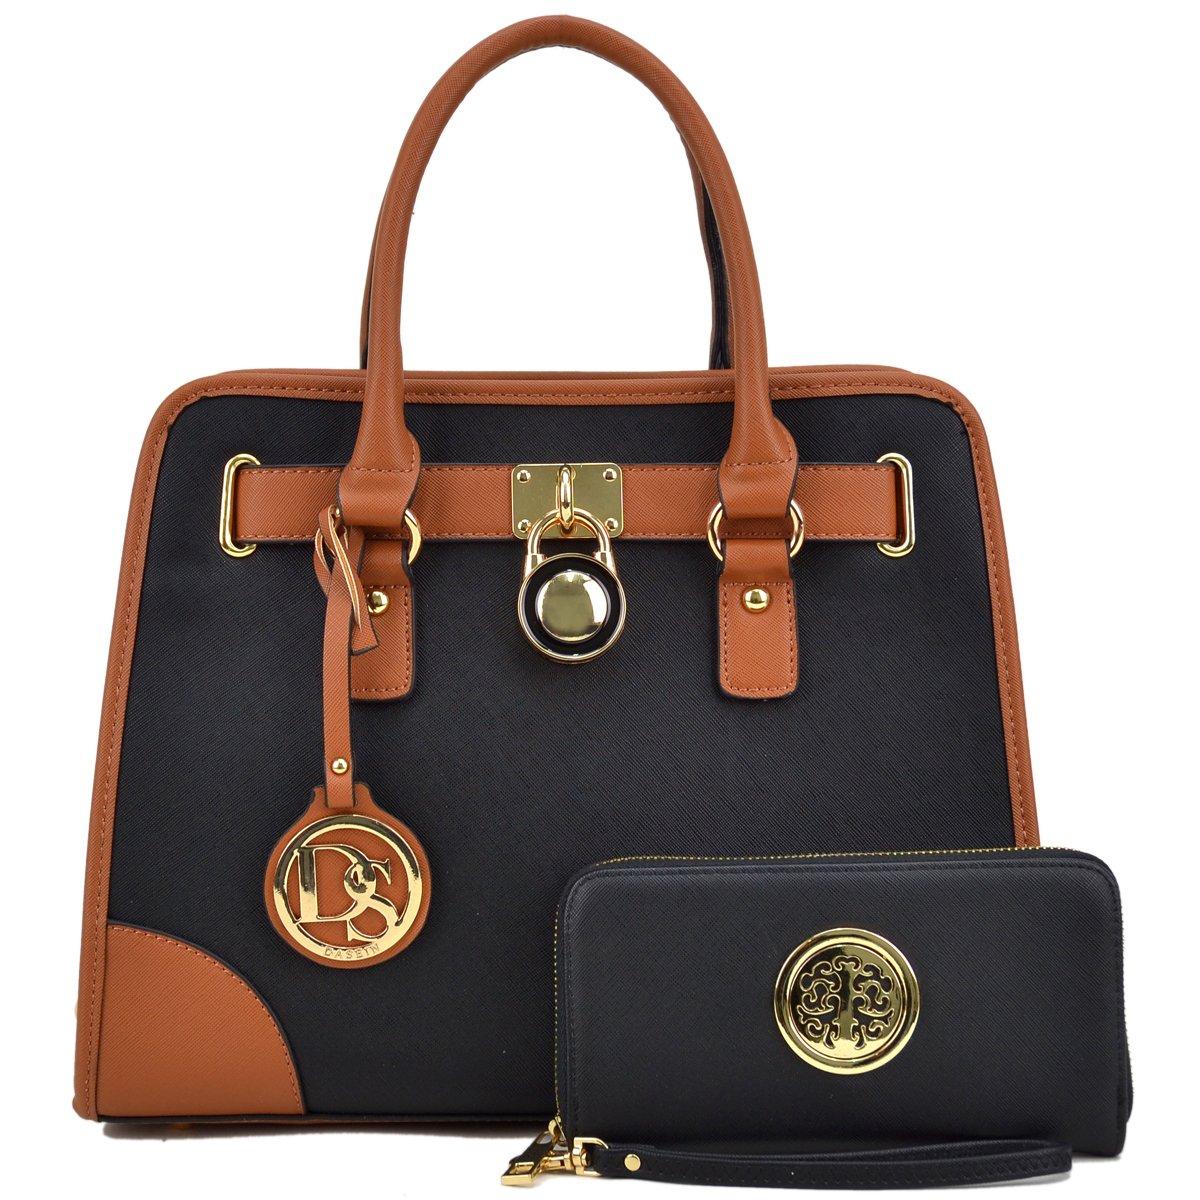 7855d1e89280 Women Designer Handbags and Purses Ladies Satchel Bags Shoulder Bags Top  Handle Bags w Matching